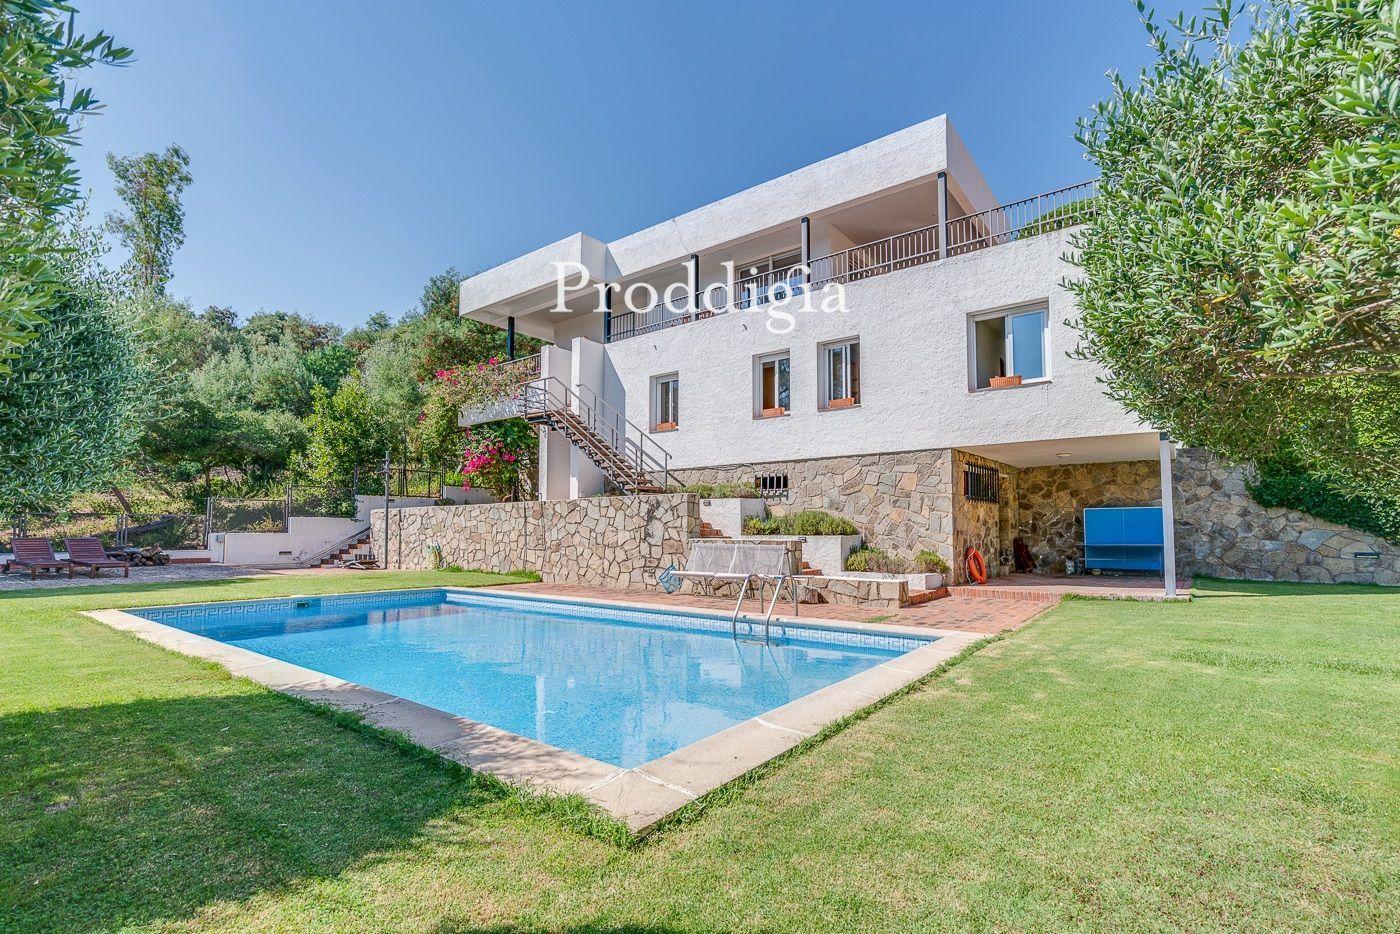 Espectacular chalet independiente con piscina privada